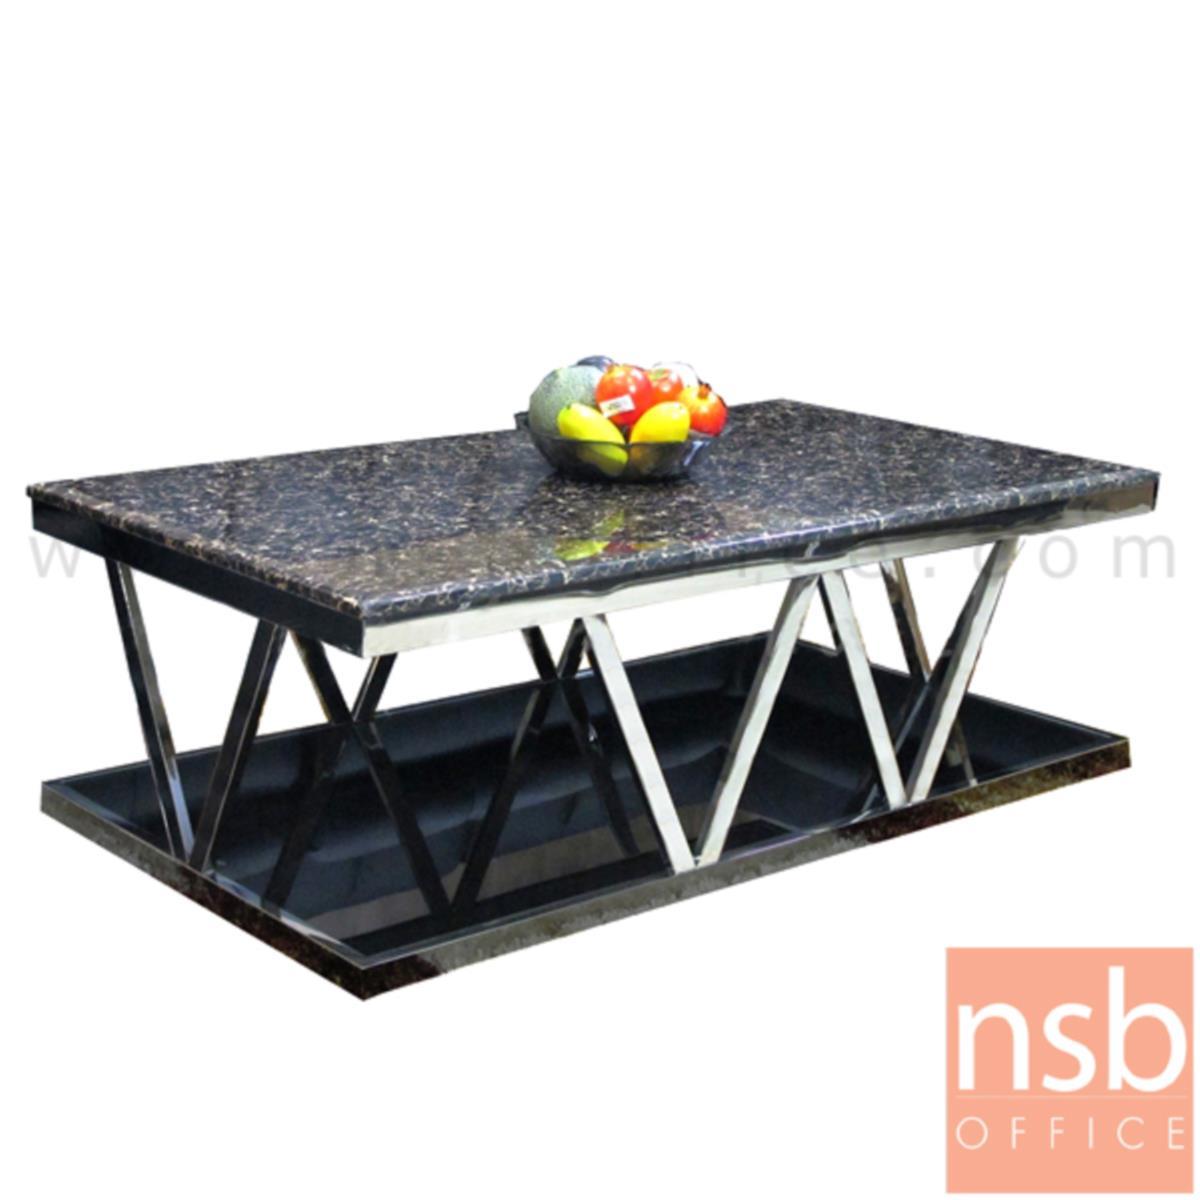 B13A180:โต๊ะกลางหินอ่อน  รุ่น Fray (เฟรย์) ขนาด 130W cm. โครงสเตนเลส